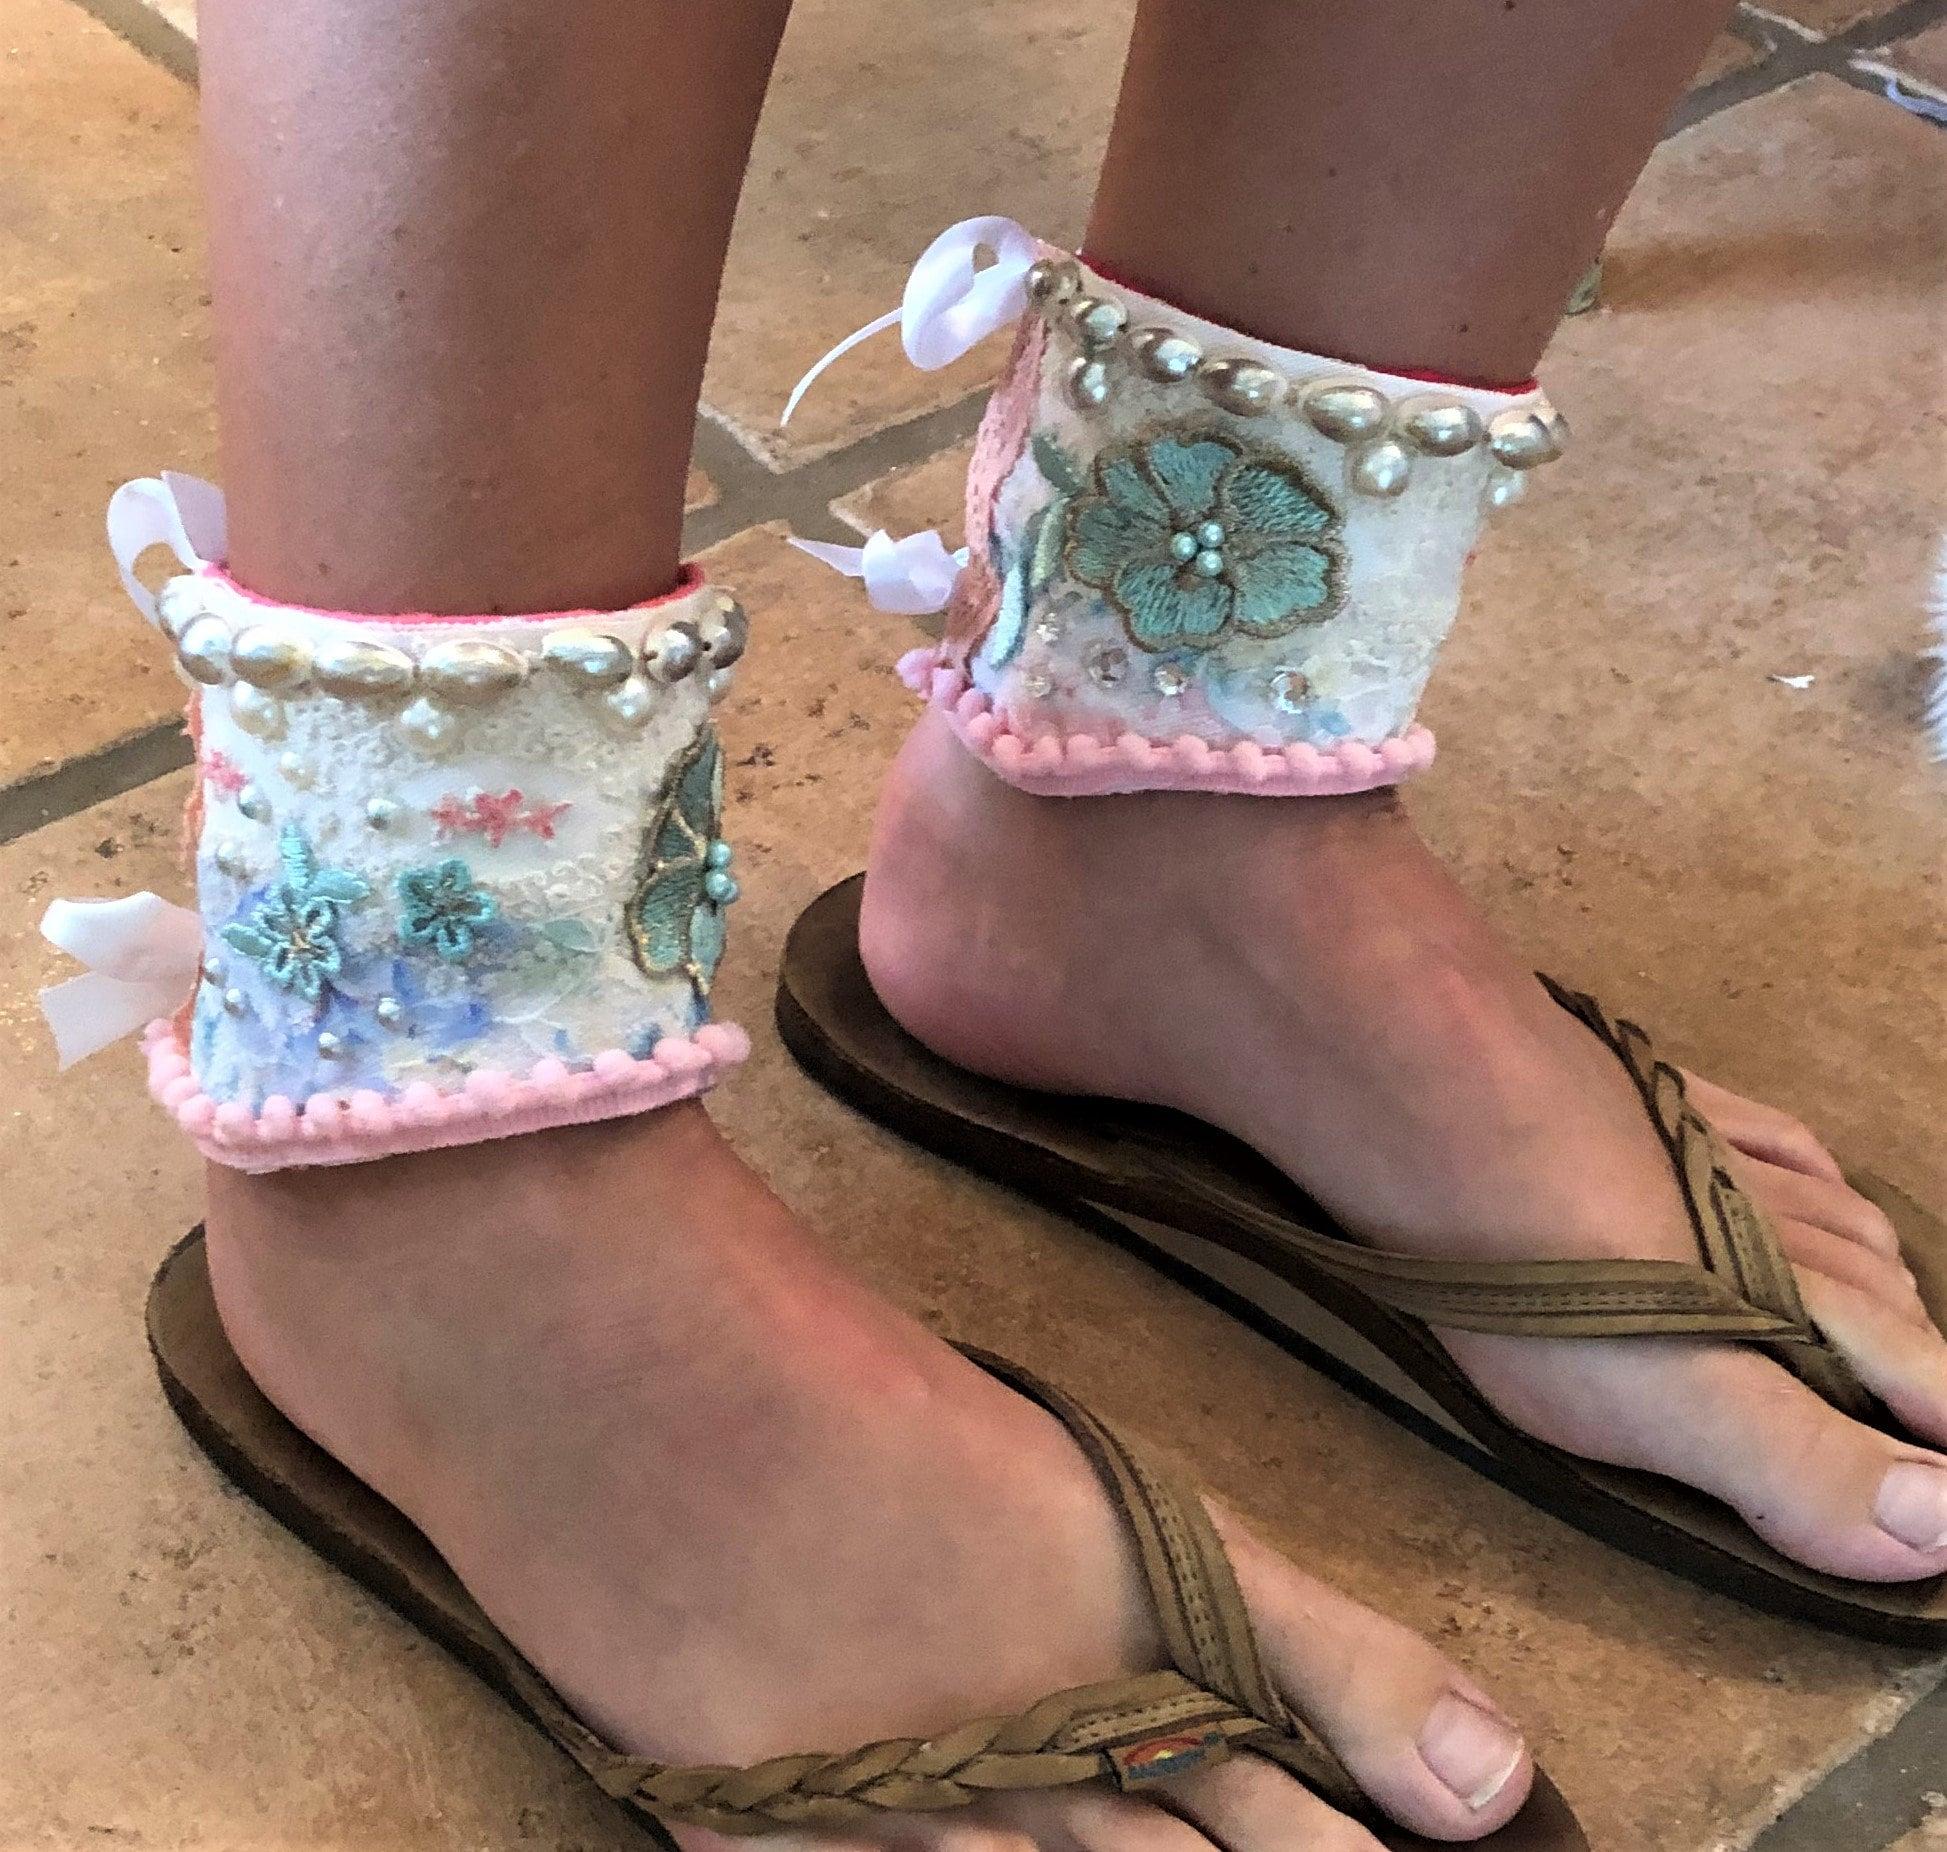 Friendship Anklet Womens Surfer Anklet Waterproof Beach Anklet Boho Ankle Bracelet Gift for Girlfriend Adjustable Beaded Anklet